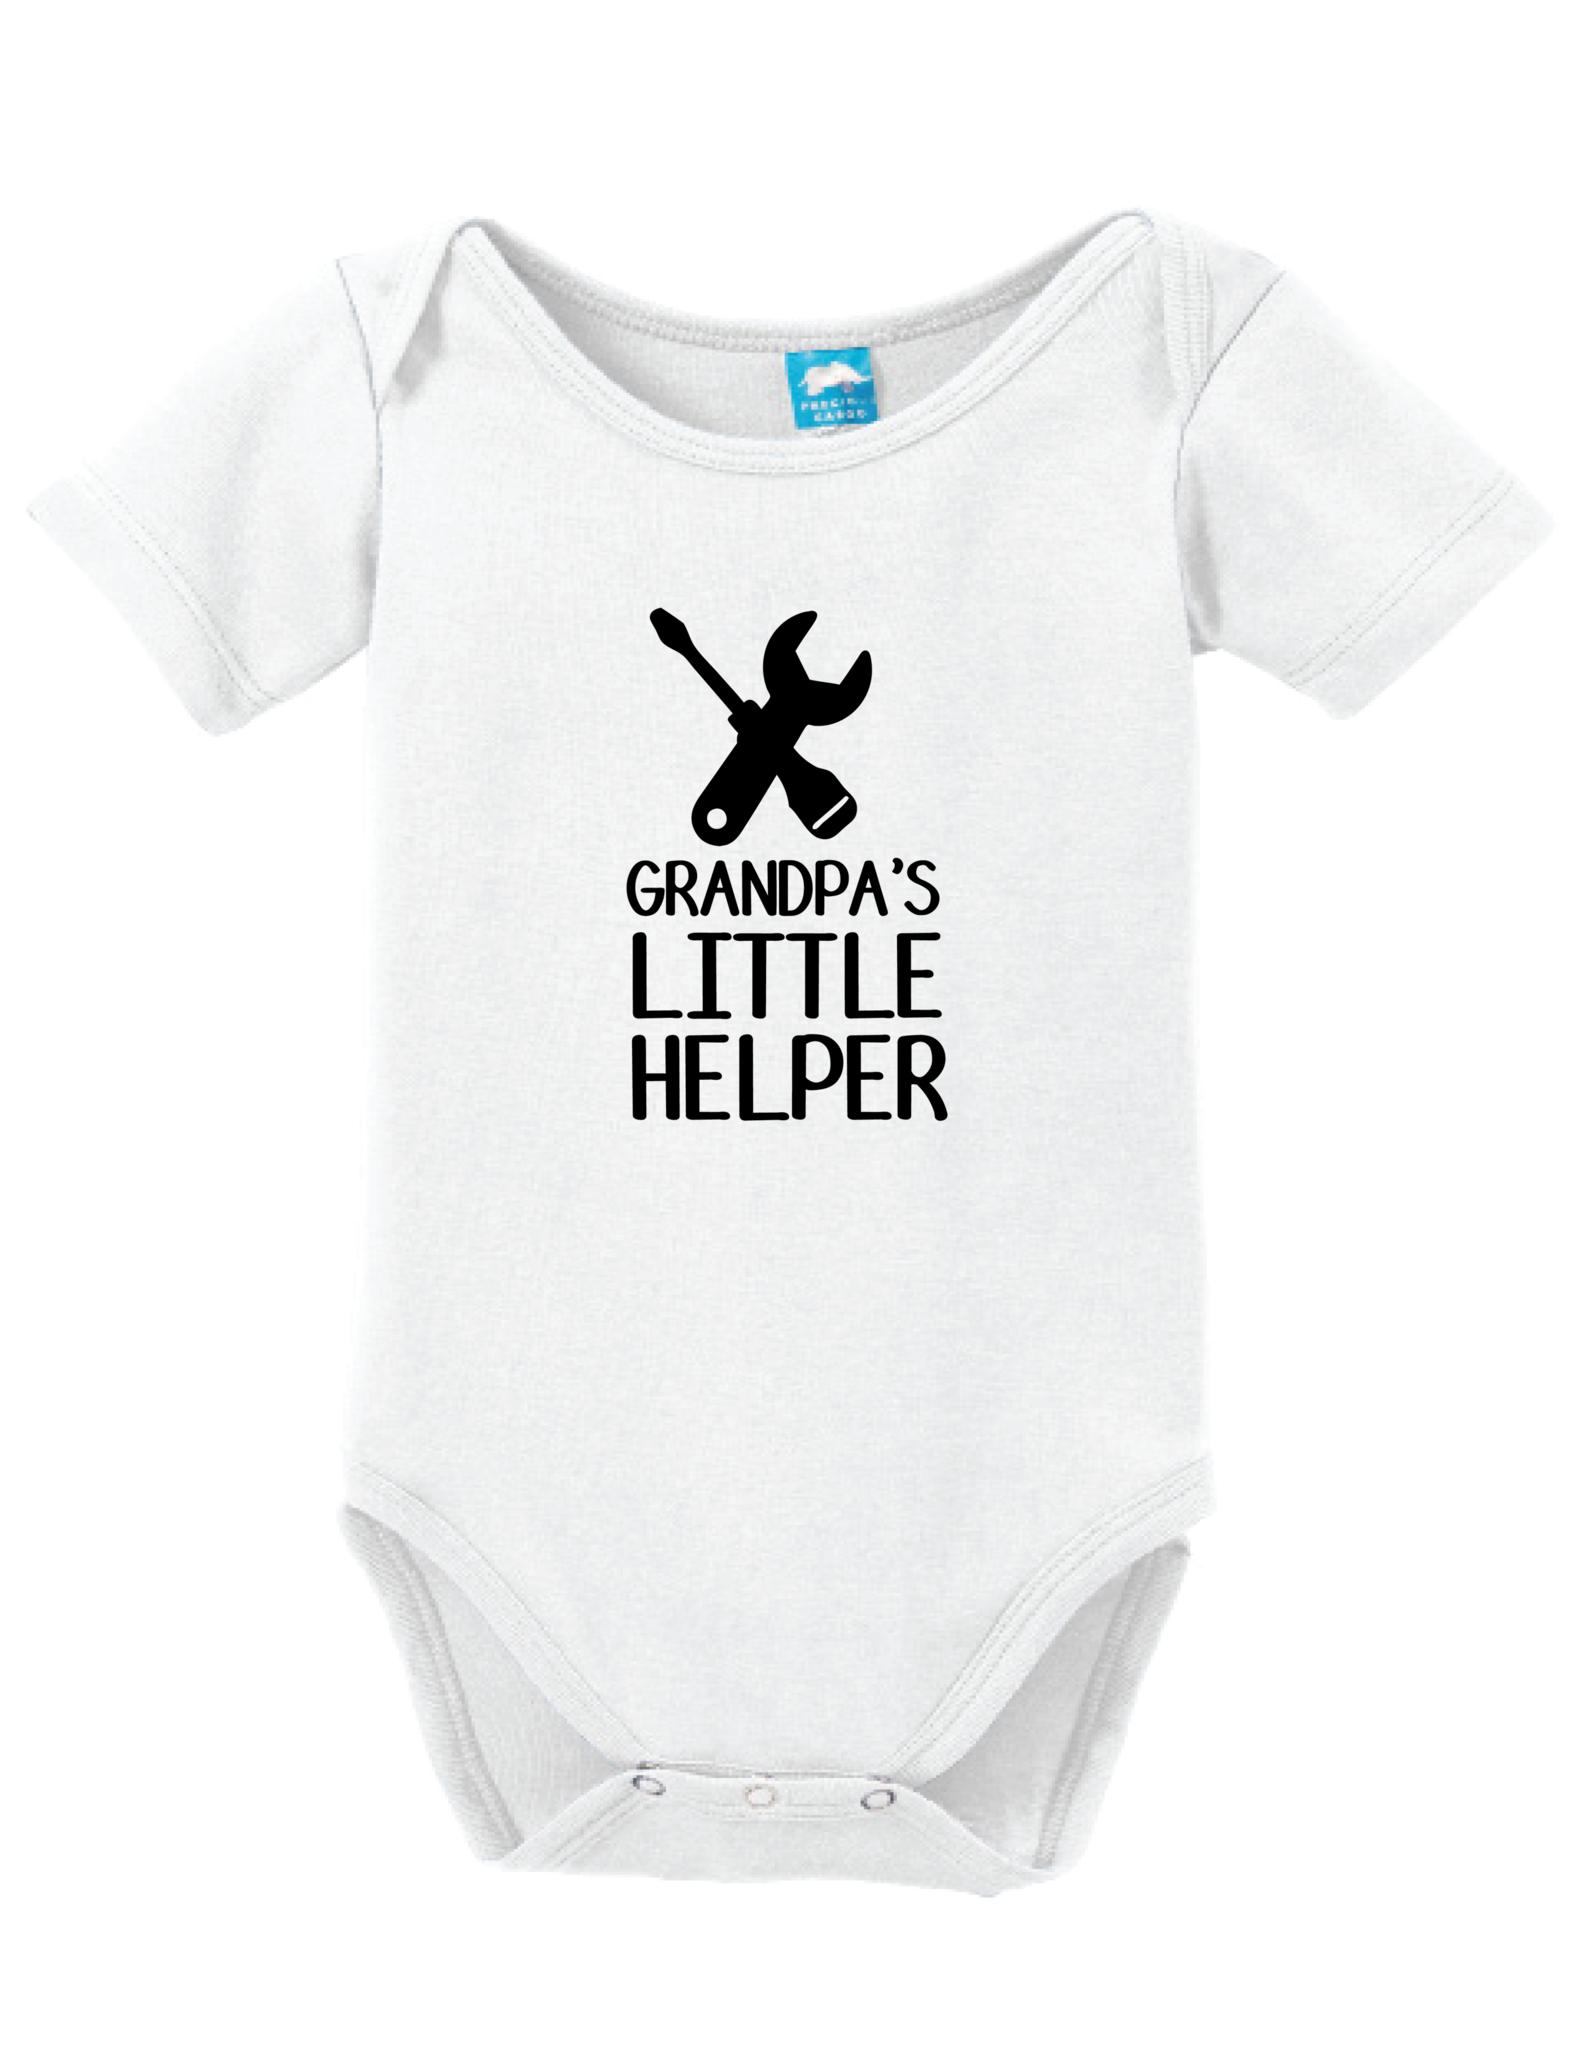 Grandpas Helper Bodysuit Onesie Funny Baby Bodysuit Baby Boy Outfits Camo Baby Stuff